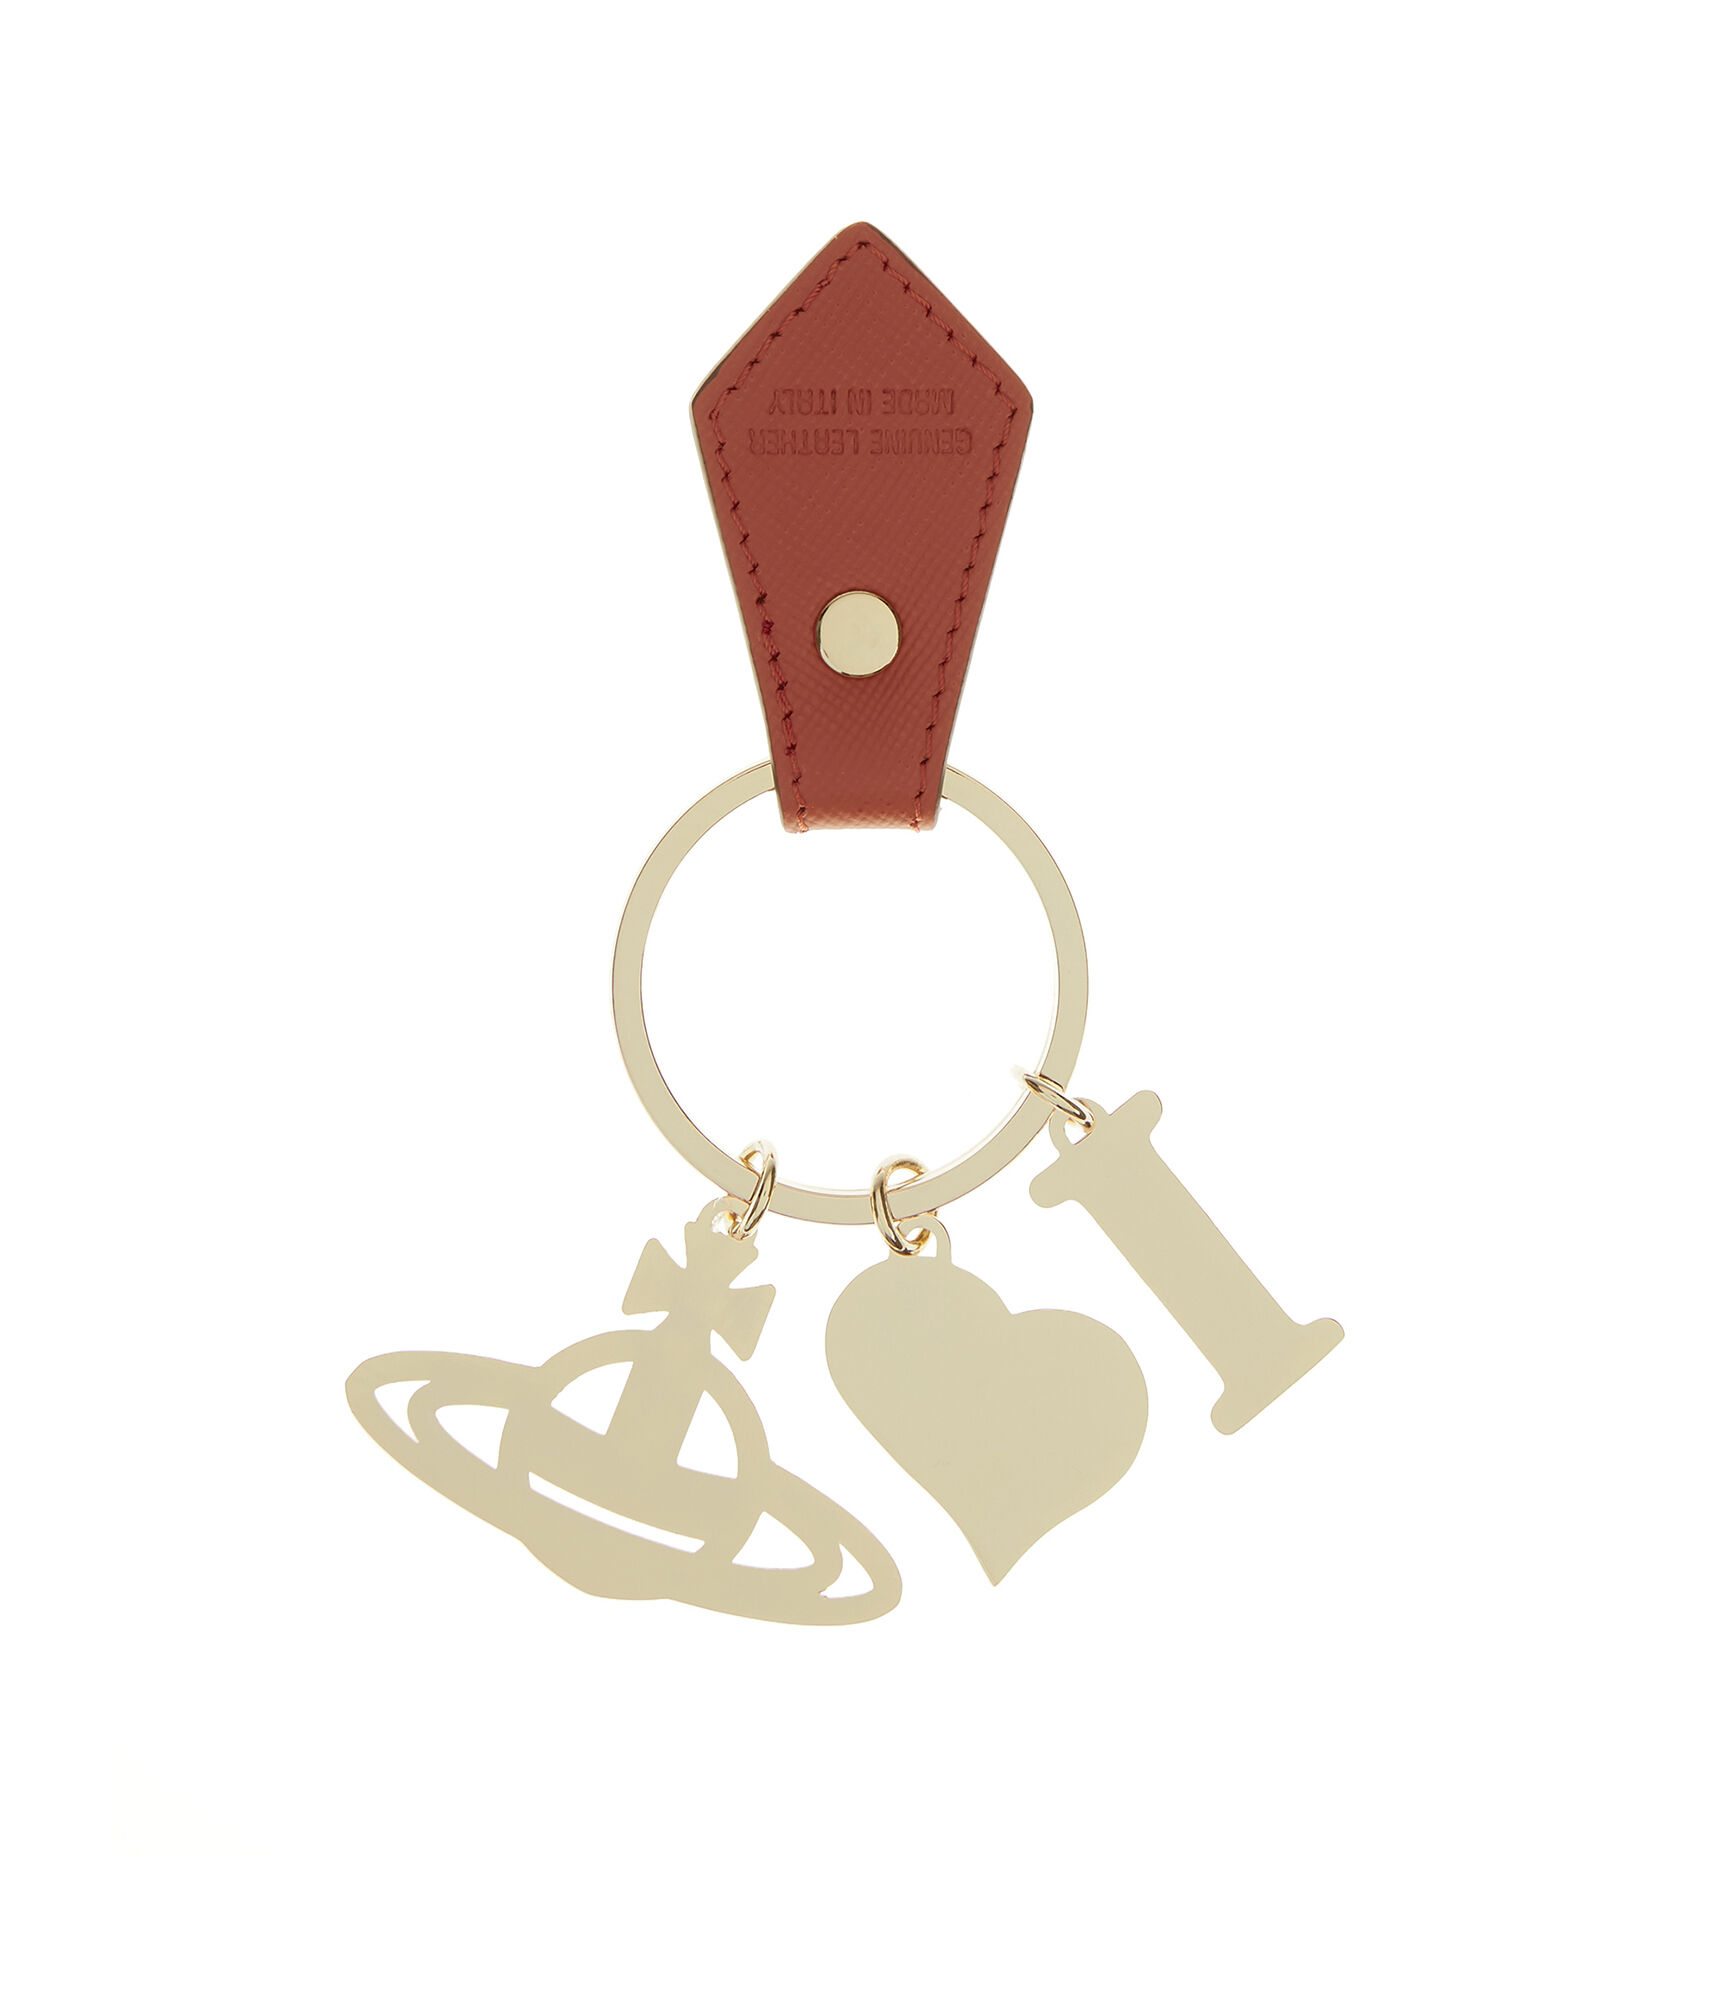 ... I Love Orb Key Ring 321566 Orange